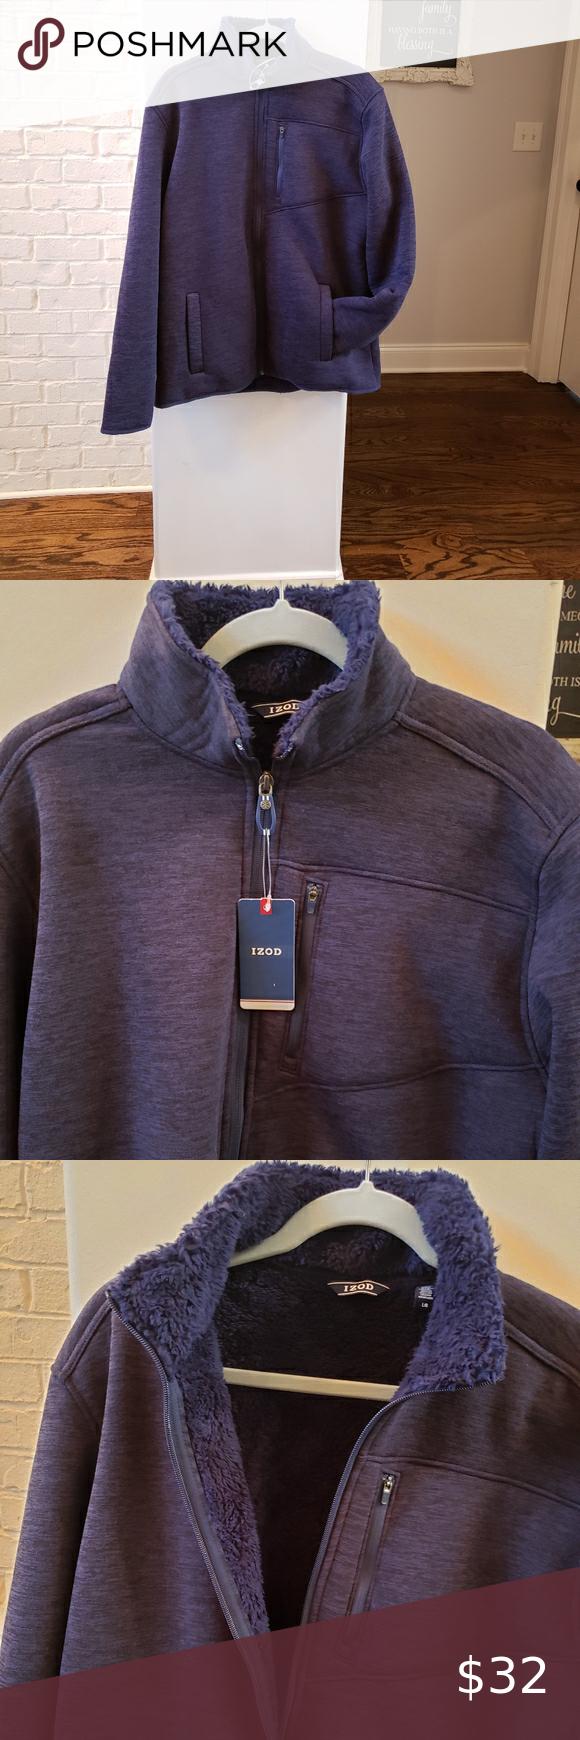 Izod Lightweight Shirts Shirt Jacket Zipper Jacket [ 1740 x 580 Pixel ]